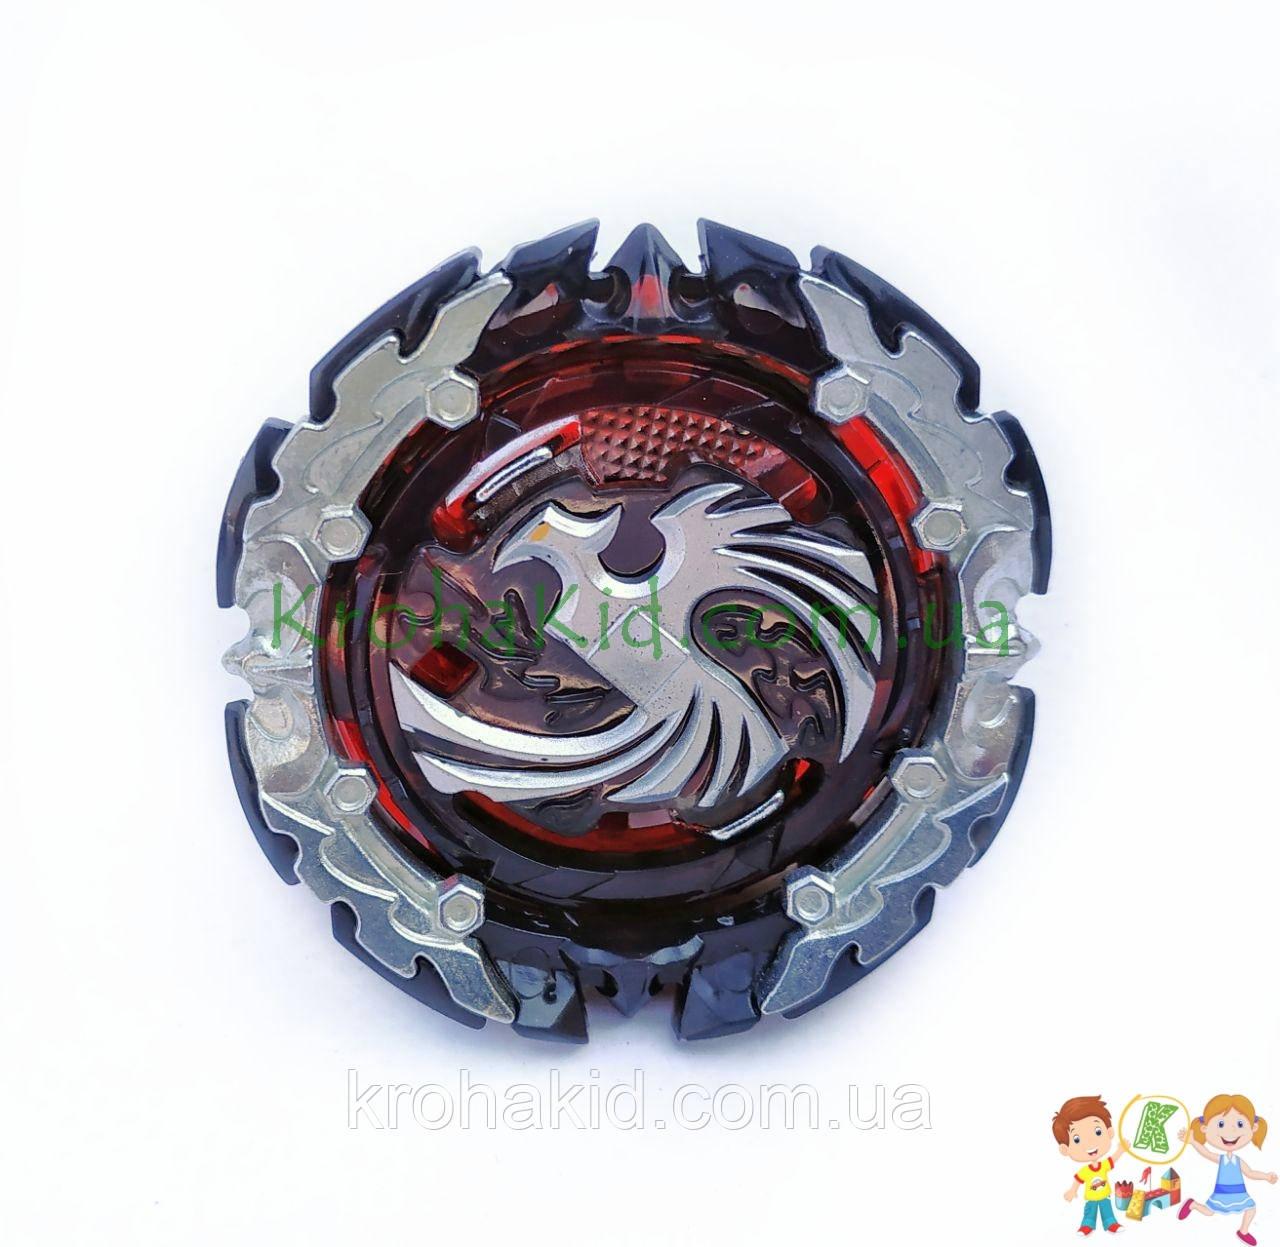 BeyBlade Dead Phoenix F5 0.At. B-131 / Бейблейд Дед Феникс F5 Flame (красный с черным)